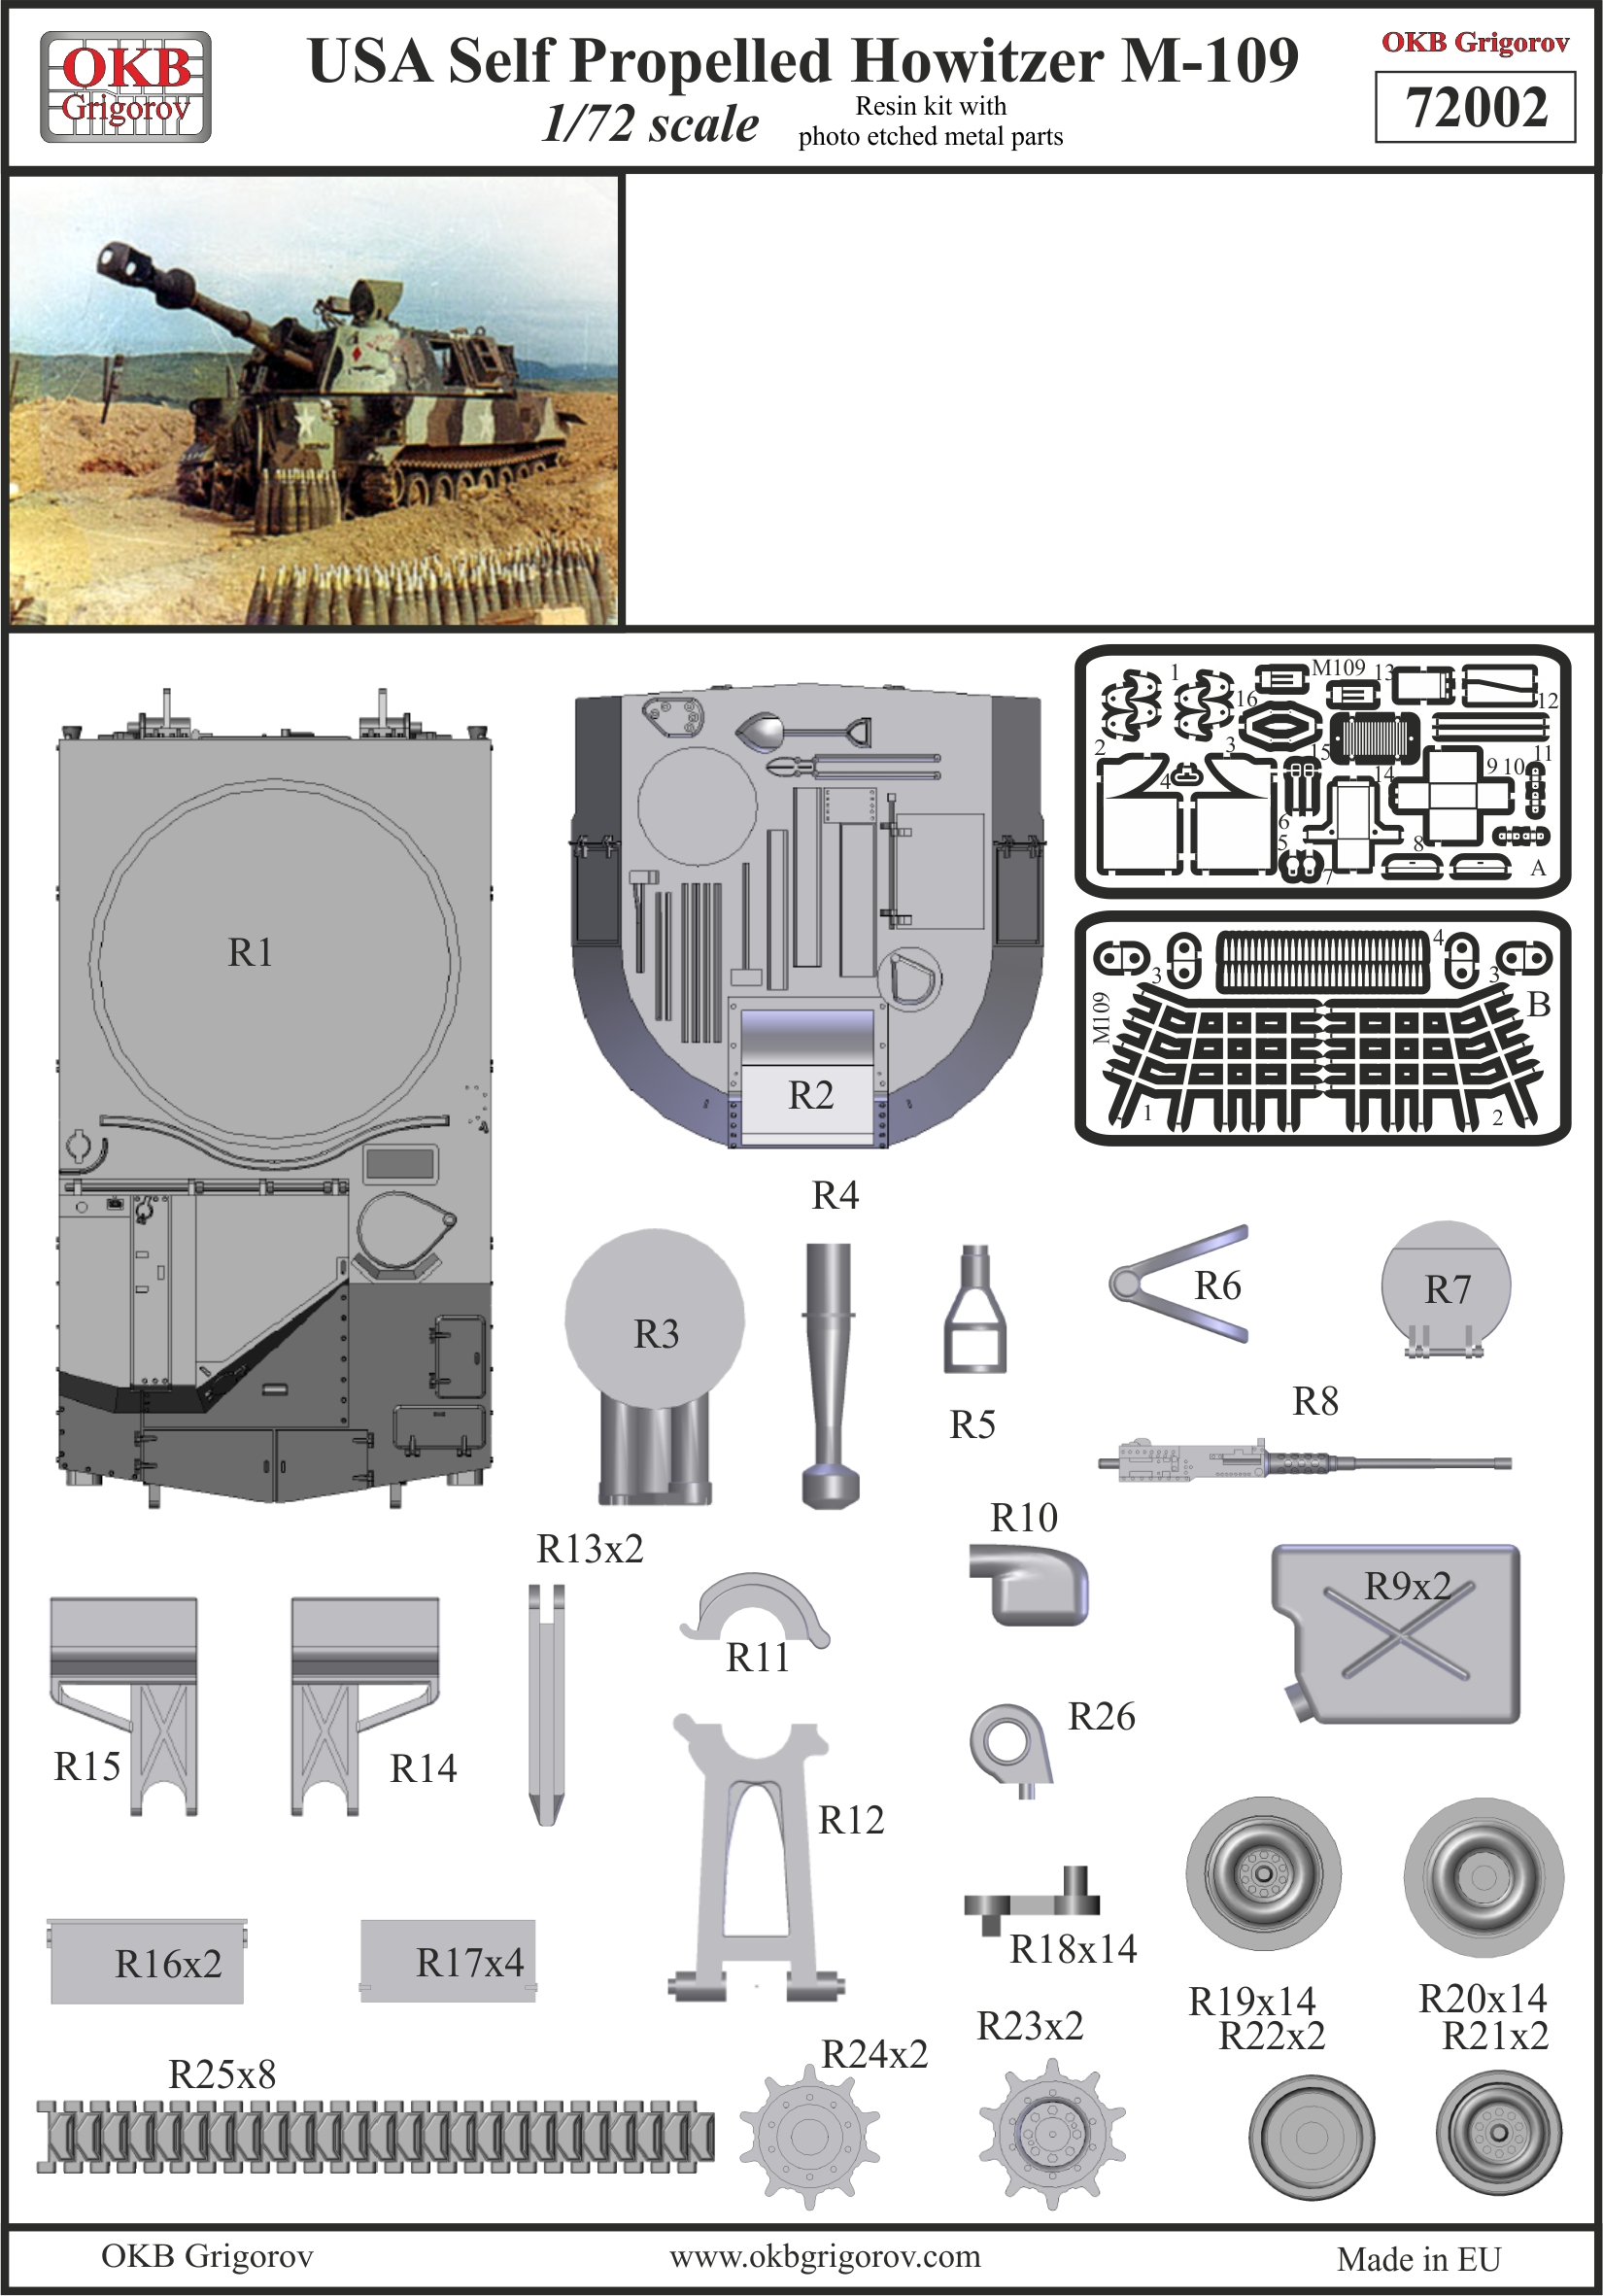 M109 by OKB Grigorov - instructions